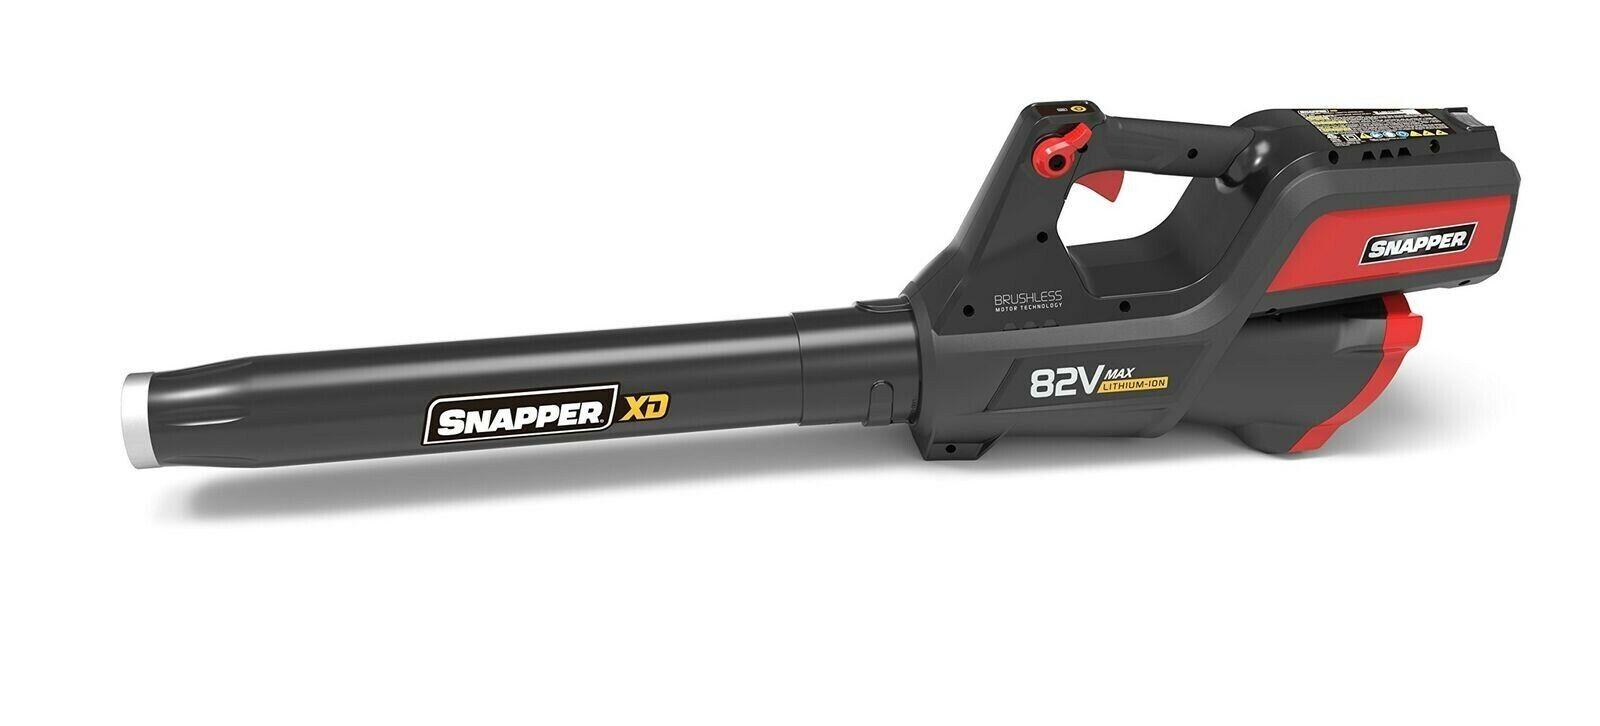 Snapper 1696775 82V Cordless Lithium-Ion 550 CFM Leaf Blower